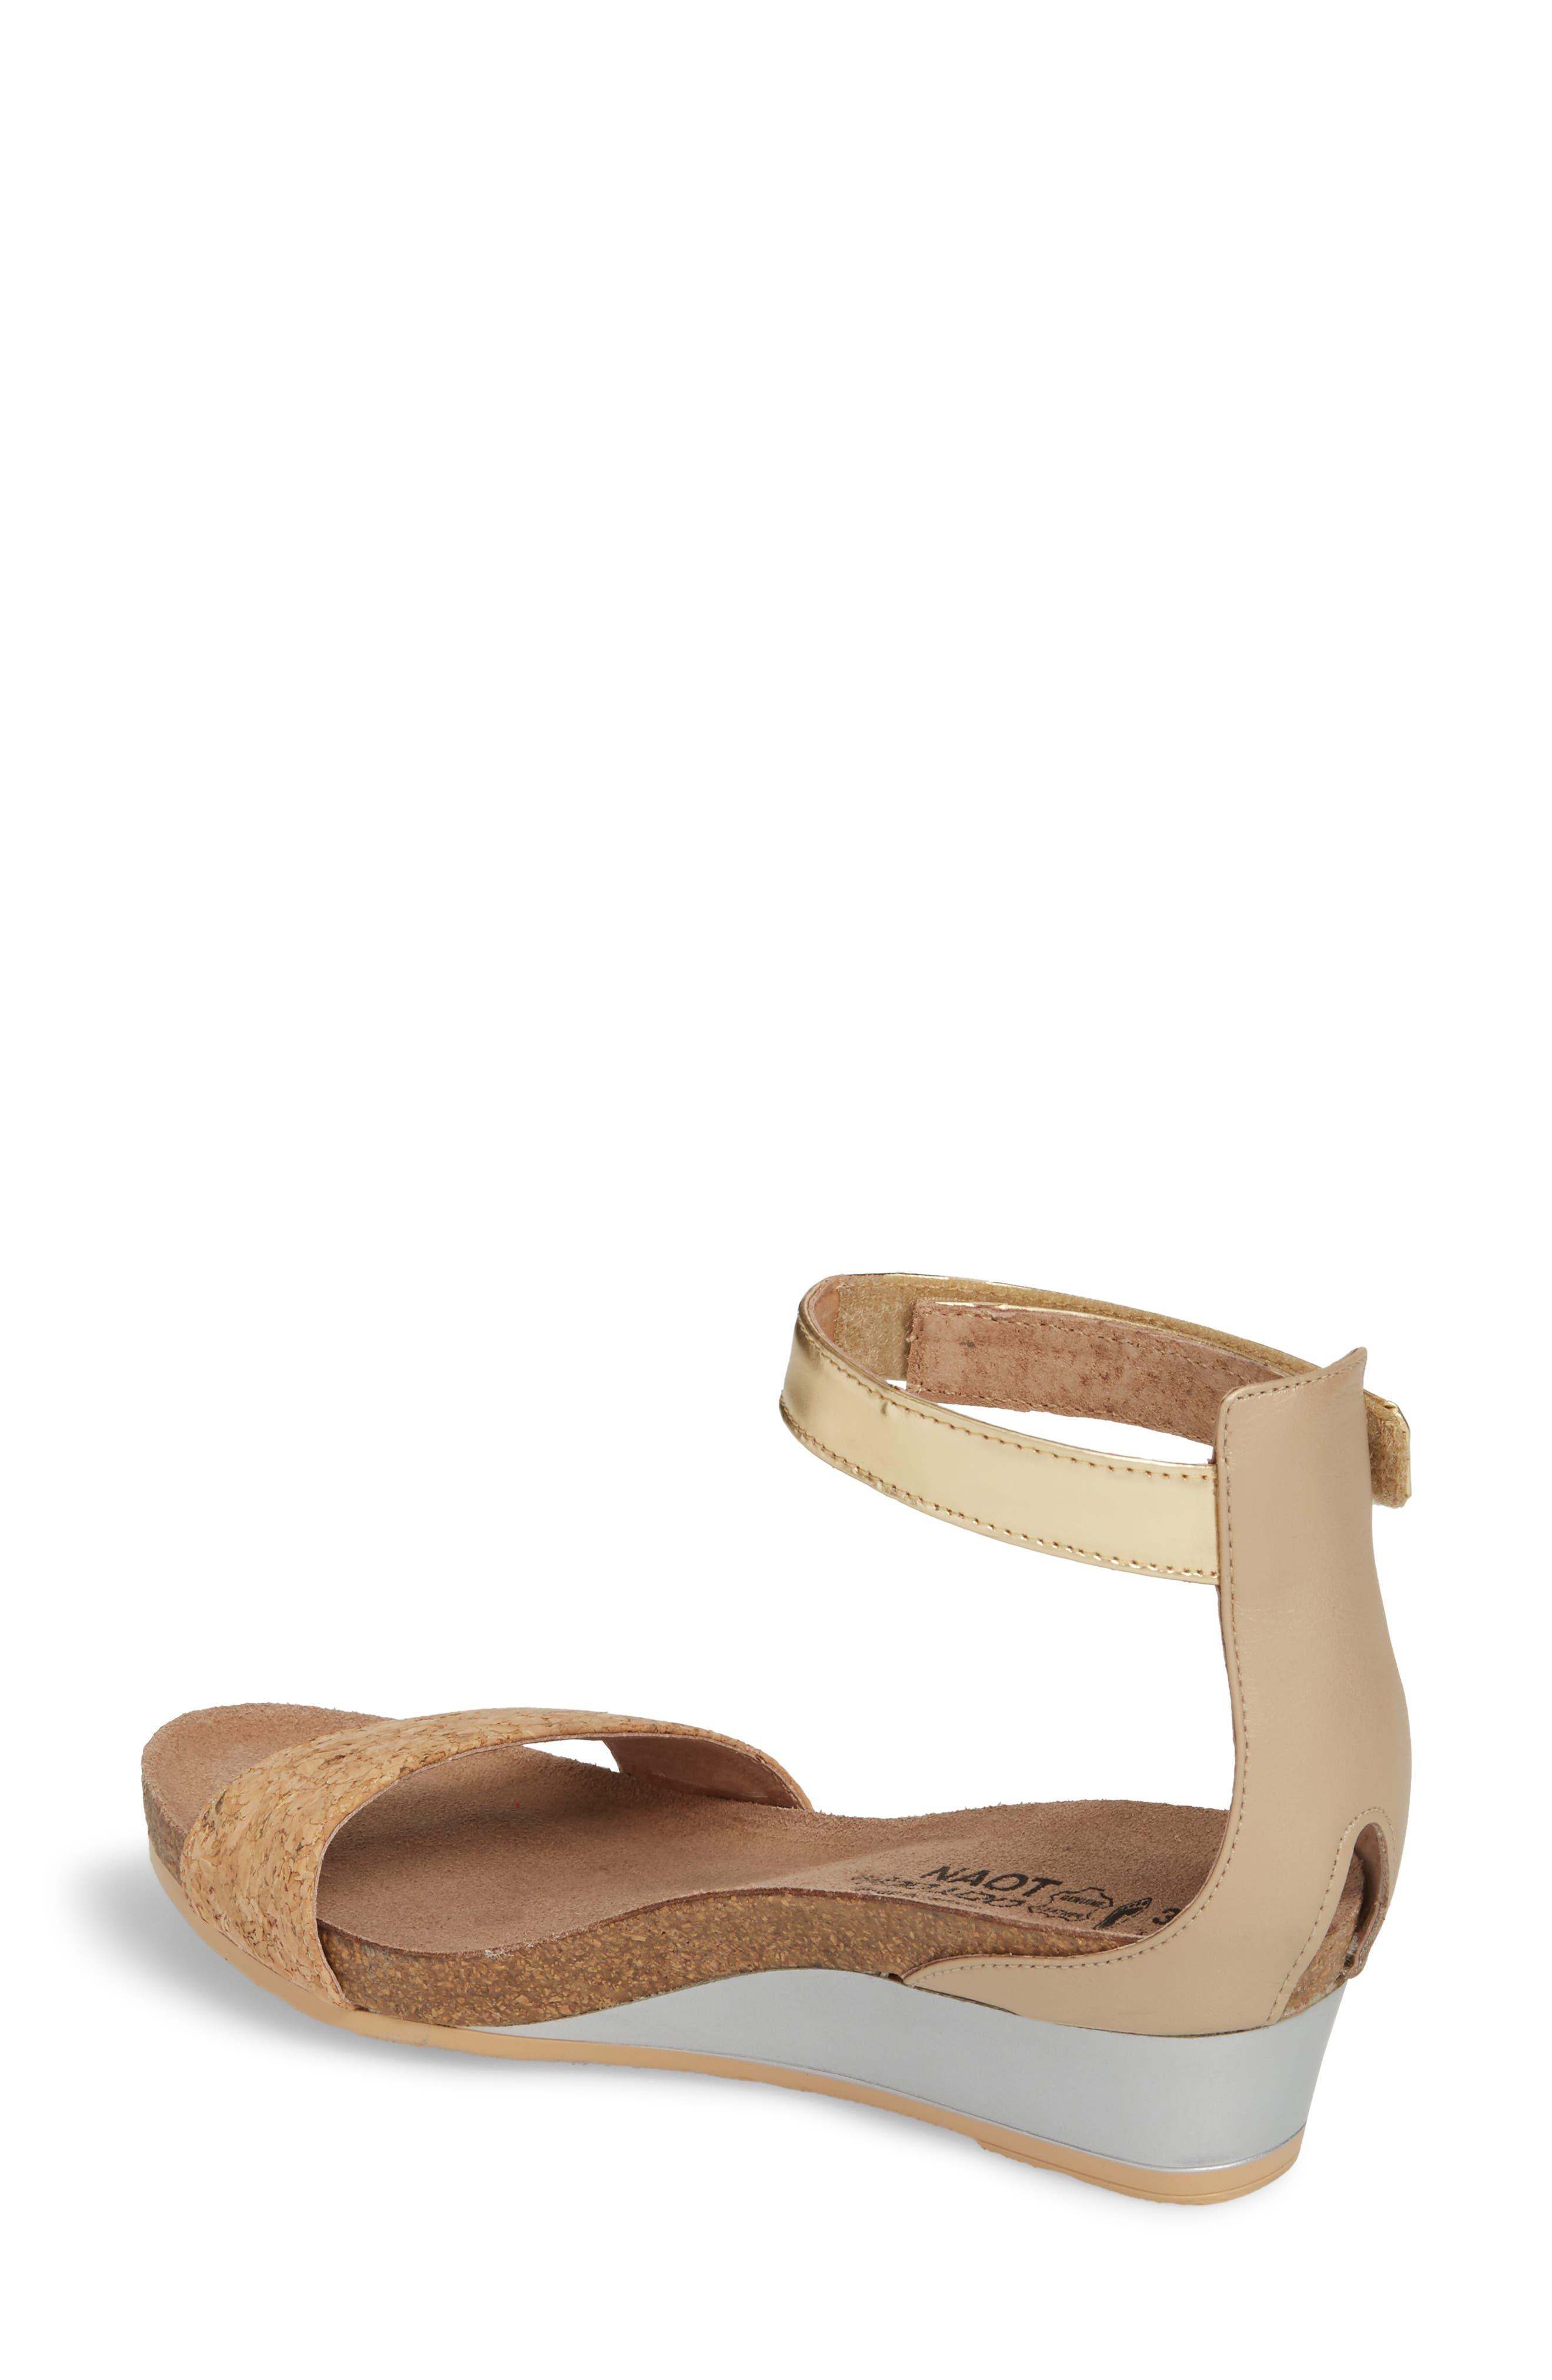 Alternate Image 3  - Naot 'Pixie' Sandal (Women)